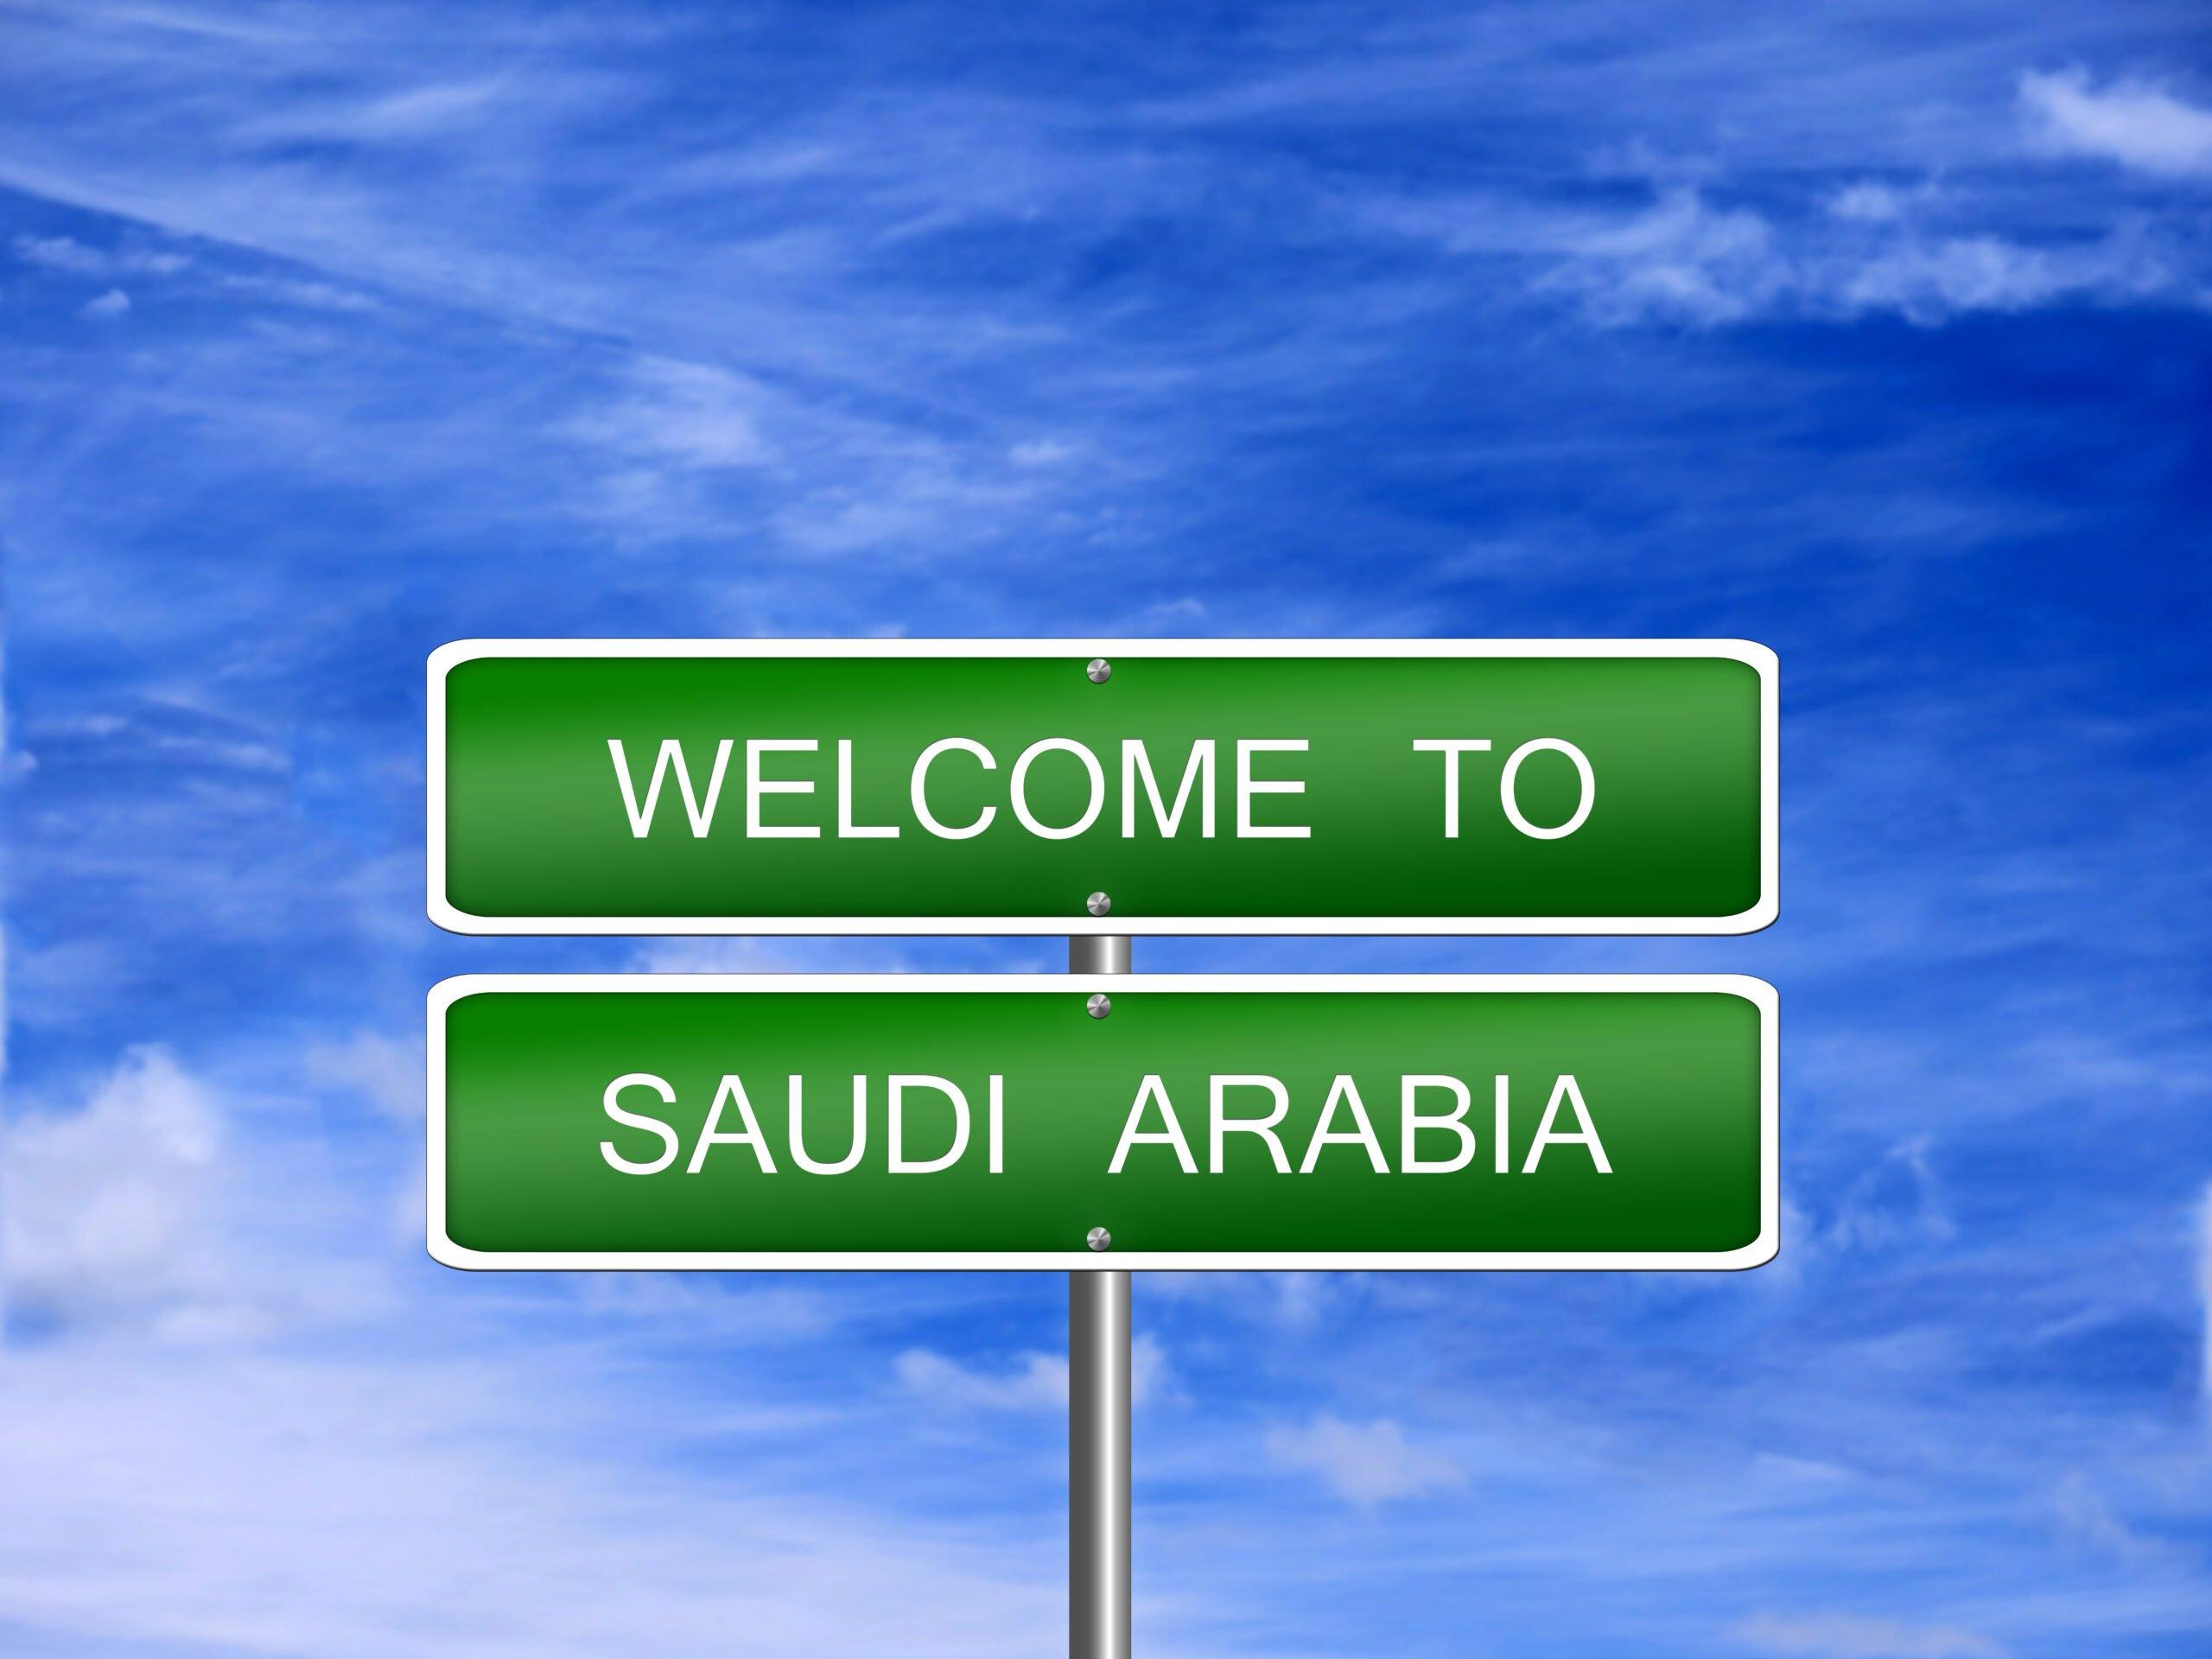 Do I Need A Visa To Visit Saudi Arabia?